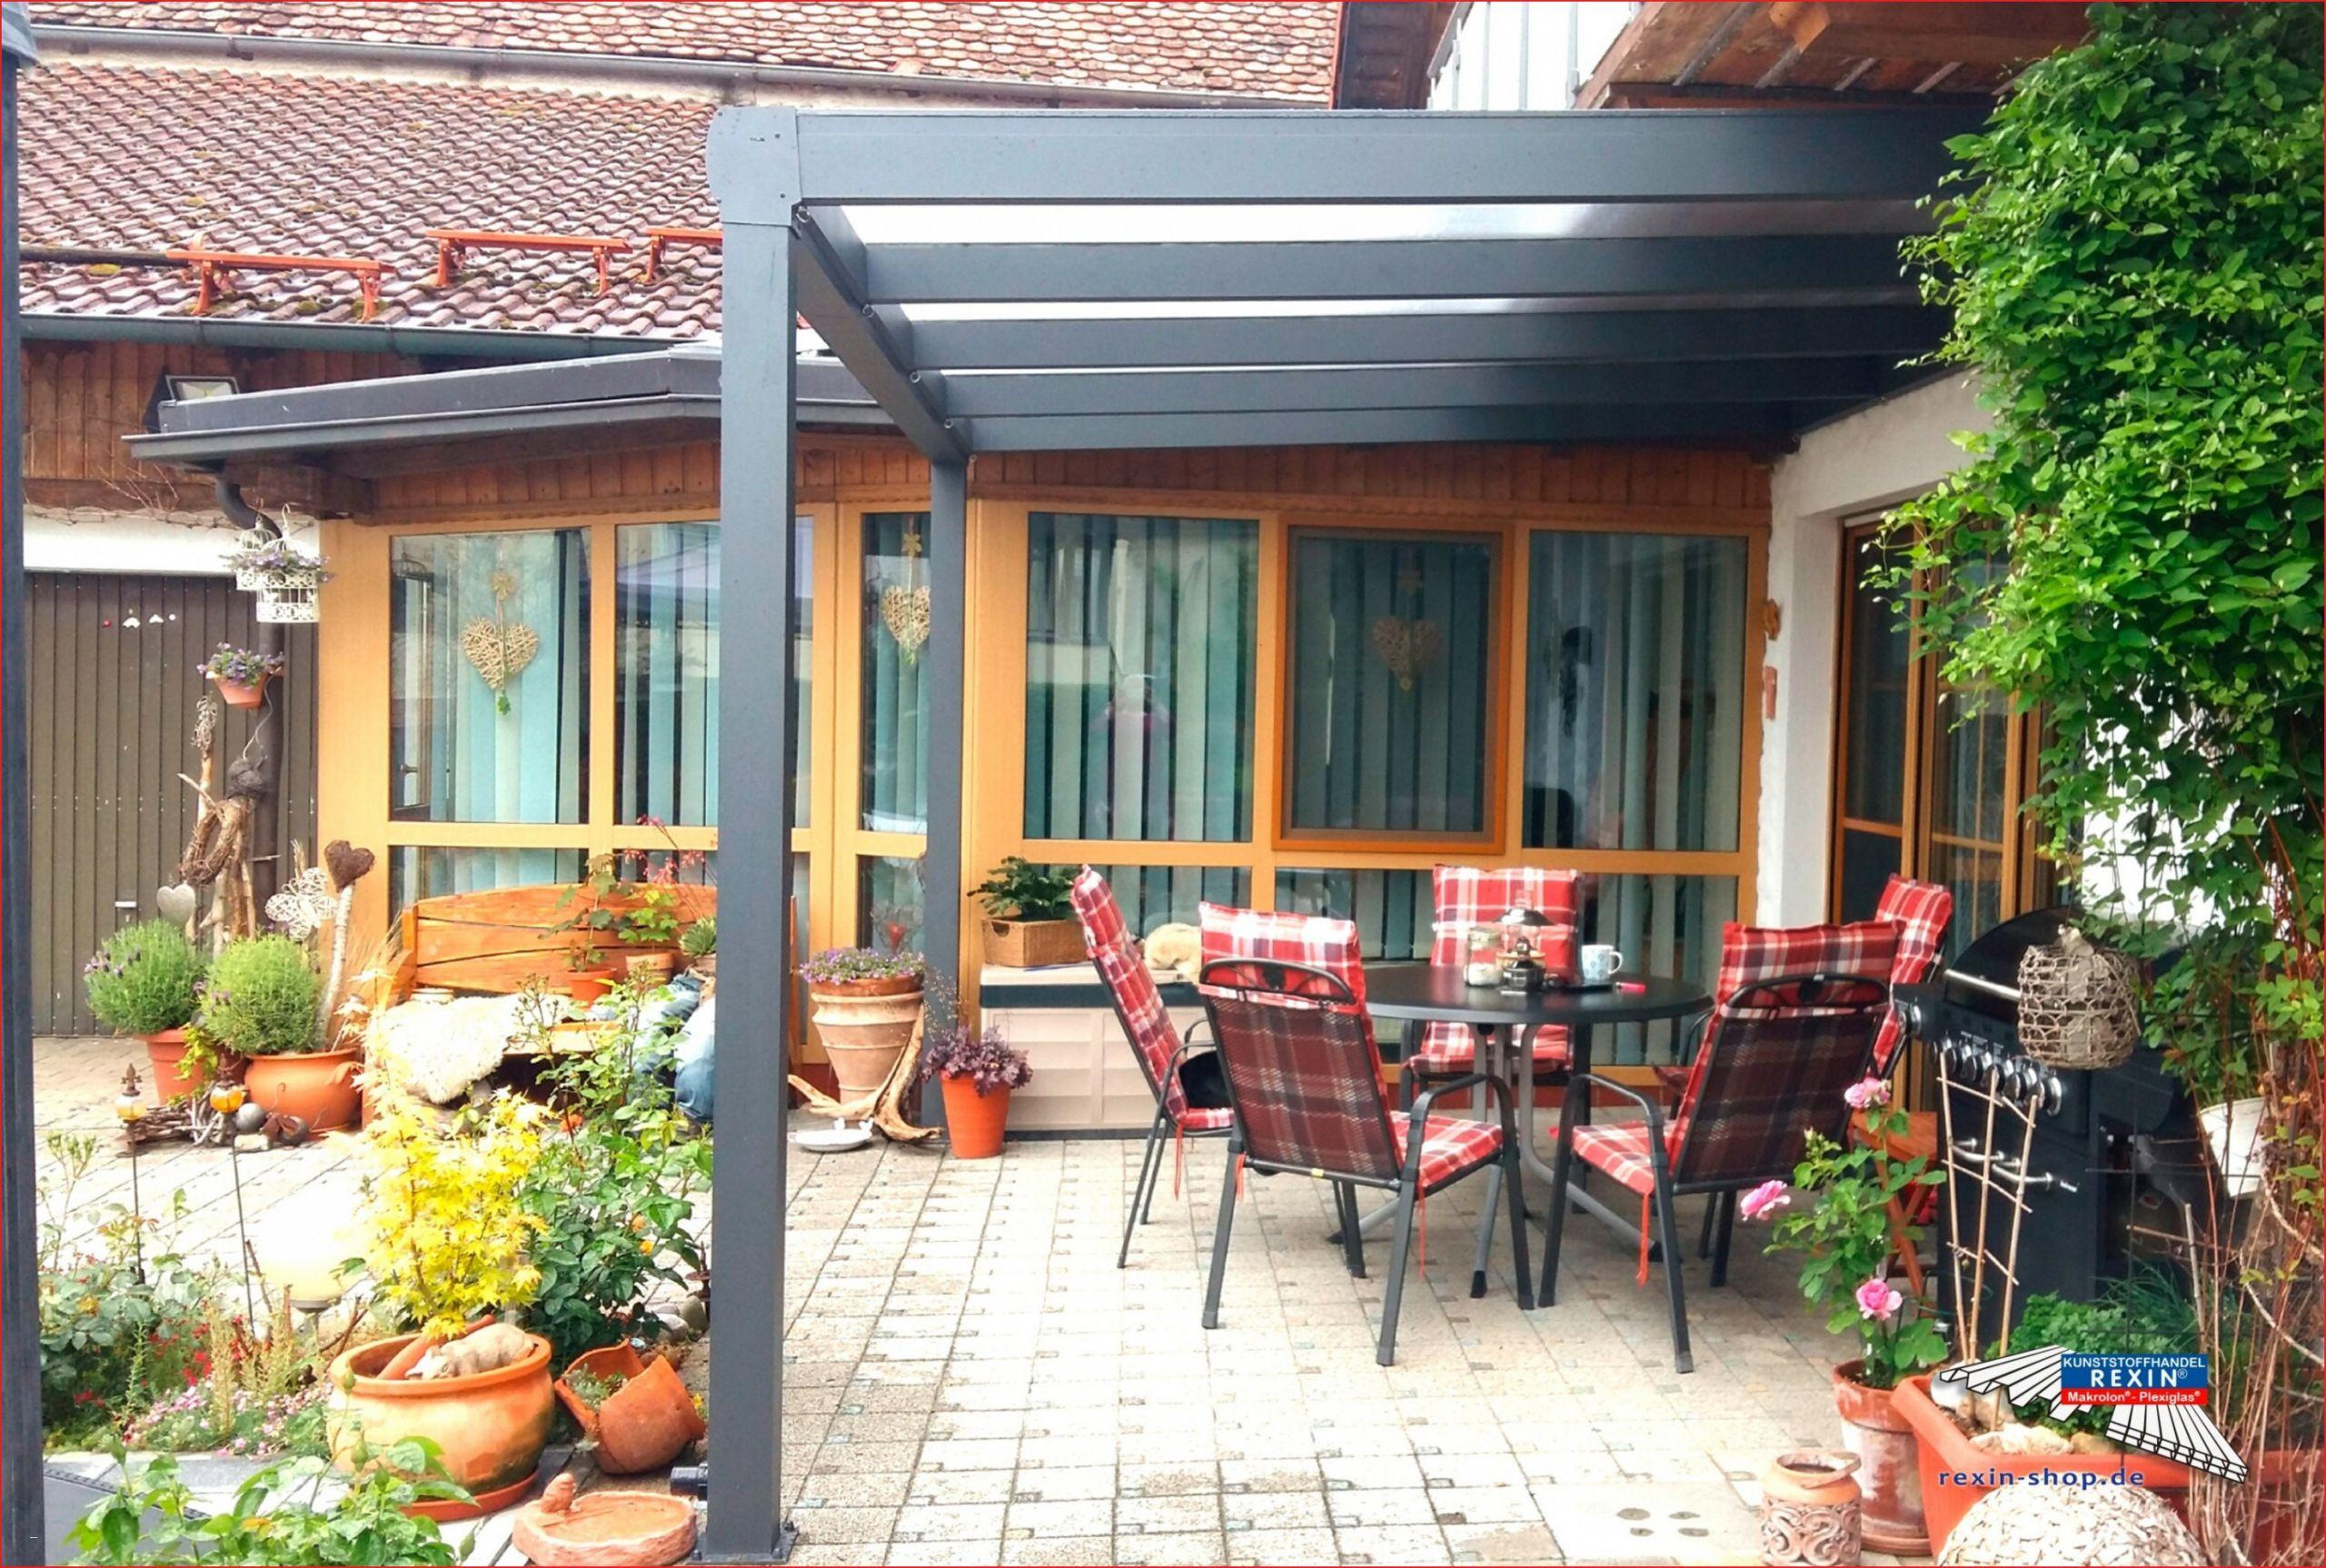 toile veranda terrasse inspirierend garten terrasse luxus veranda of toile veranda